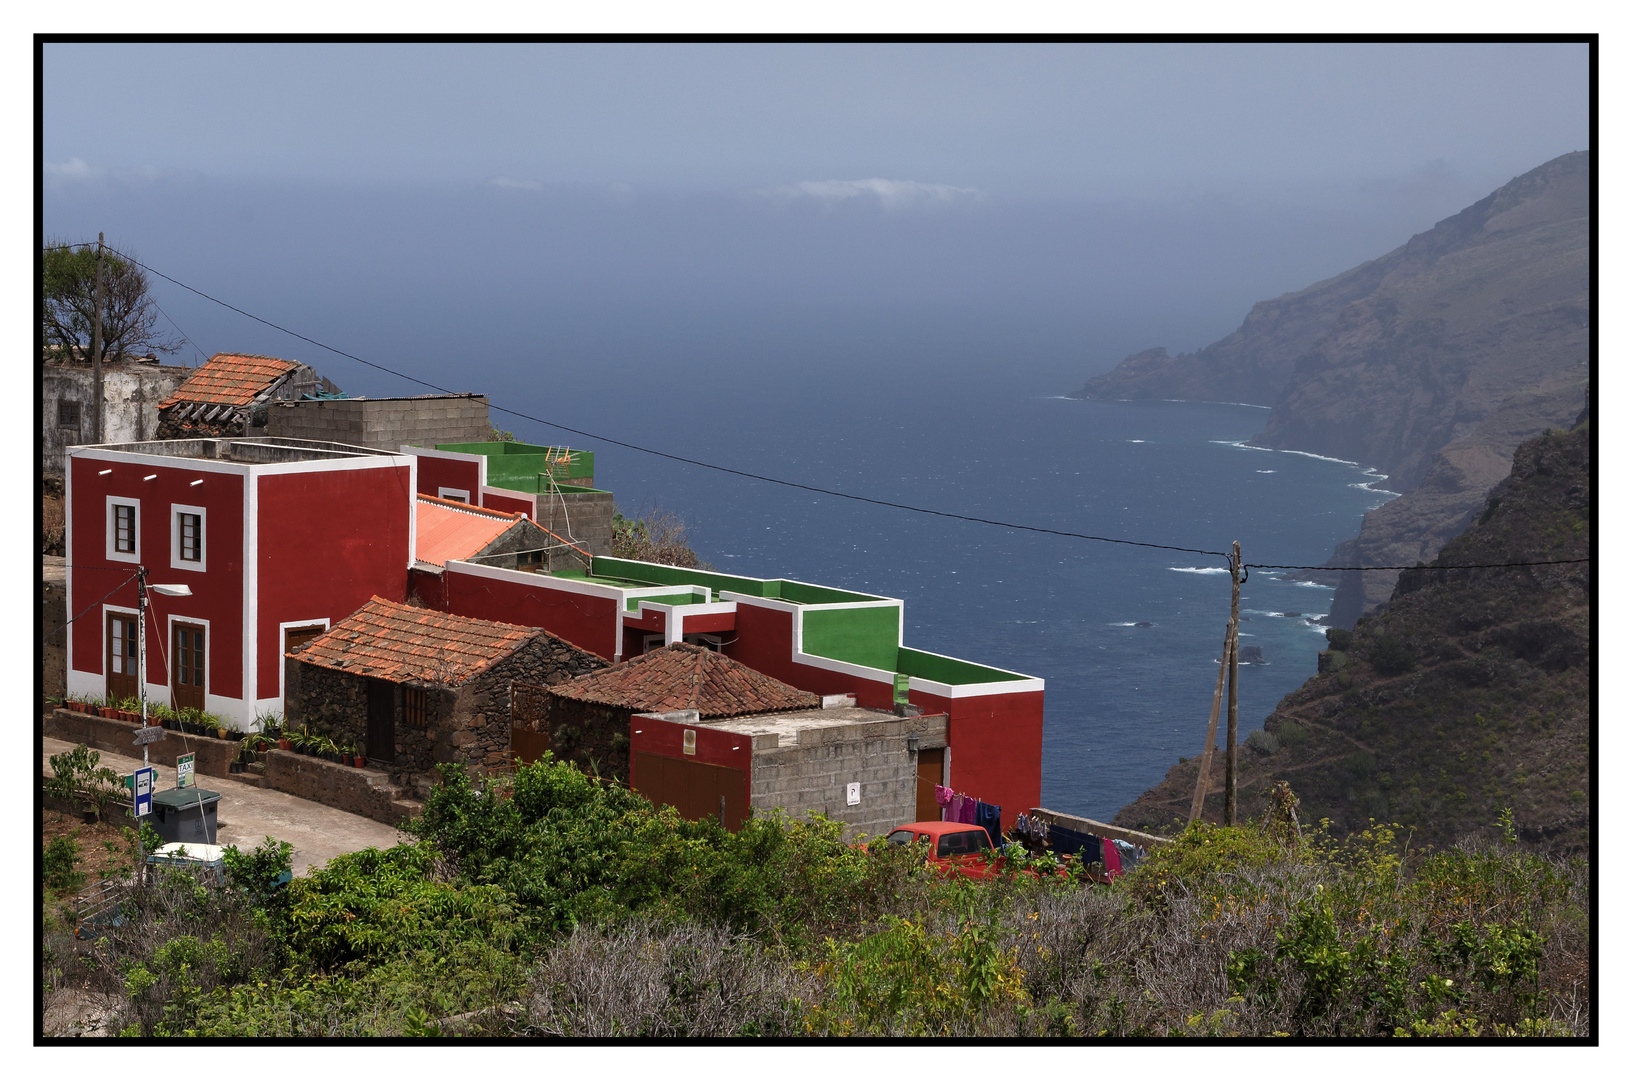 El Tablado, Nordküste La Palma, August 2013